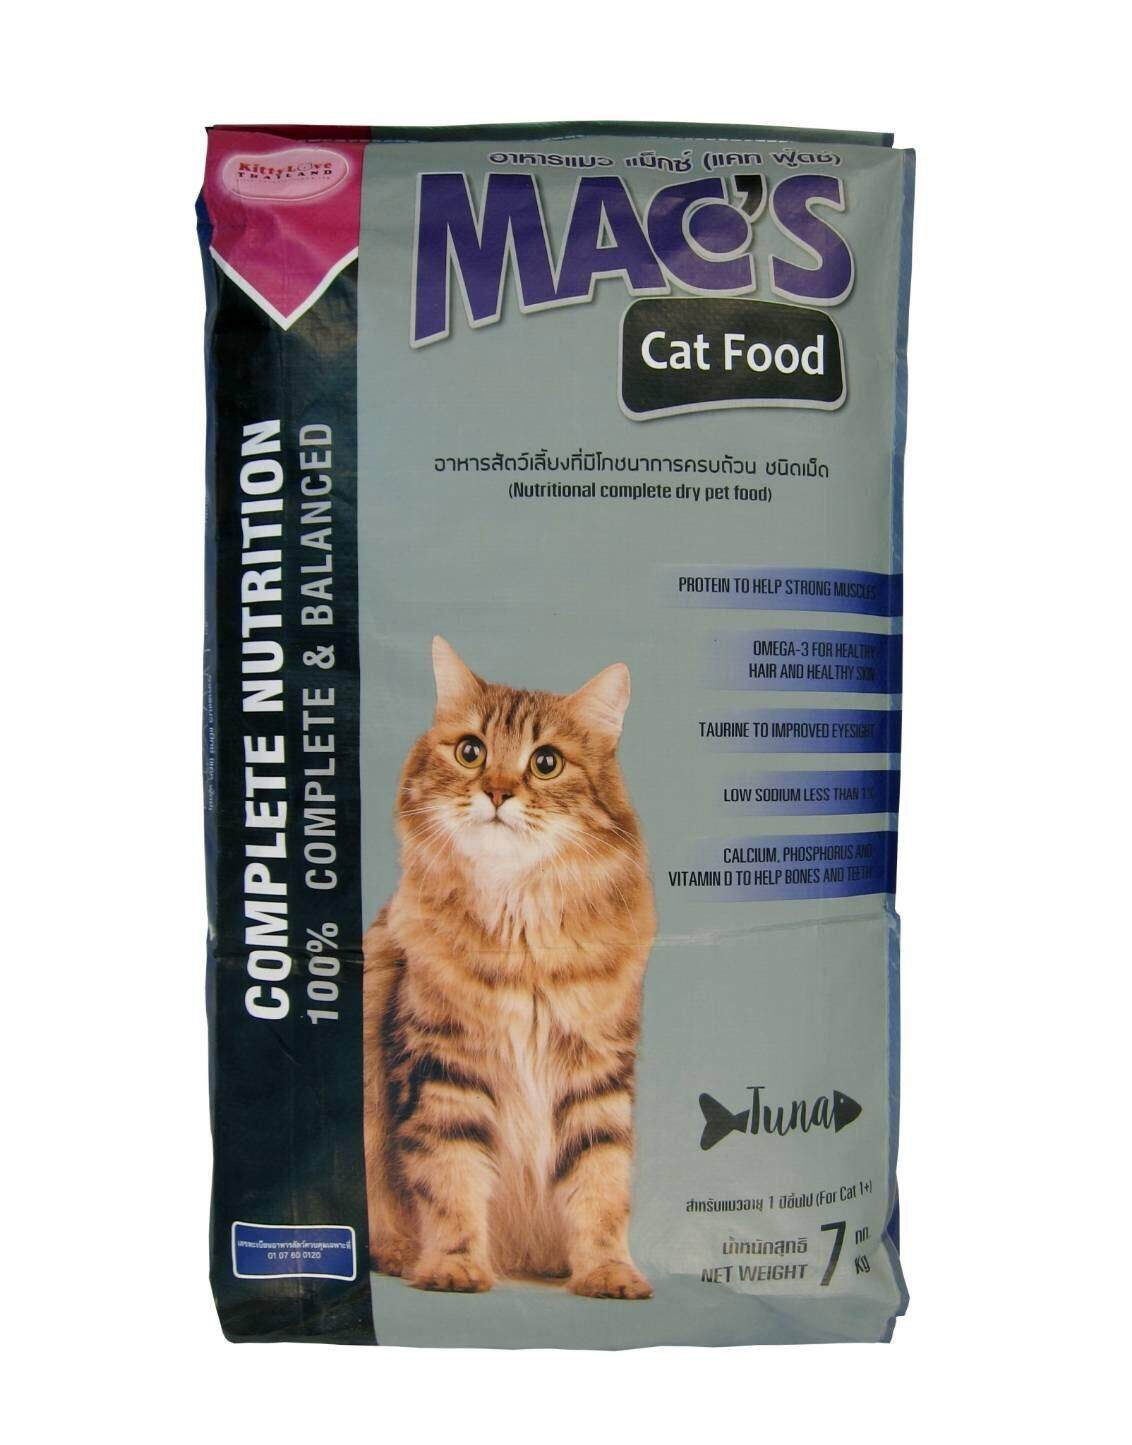 Mix Kat อาหารแมวแบบเม็ด รสทูน่า ขนาด 7 กก. By T.u. Pet Shop.